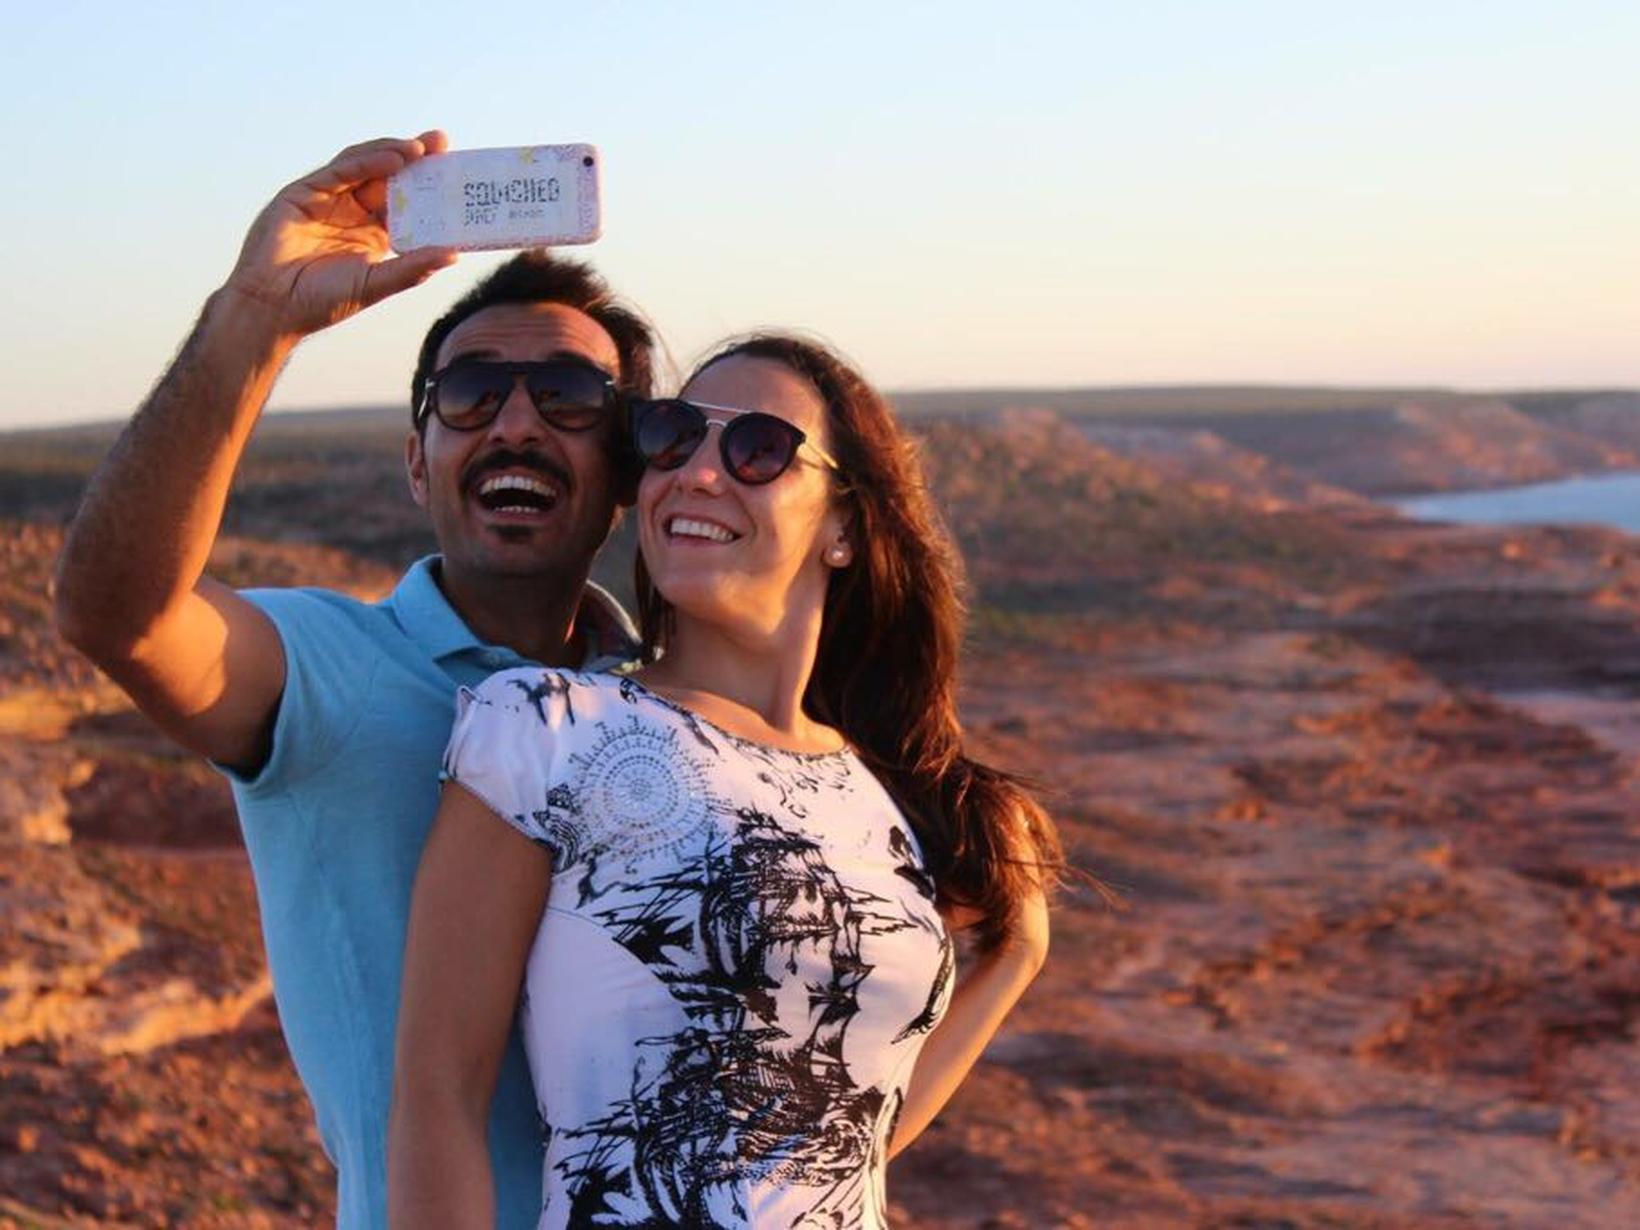 Marco & fra' & Francesca from Perth, Western Australia, Australia